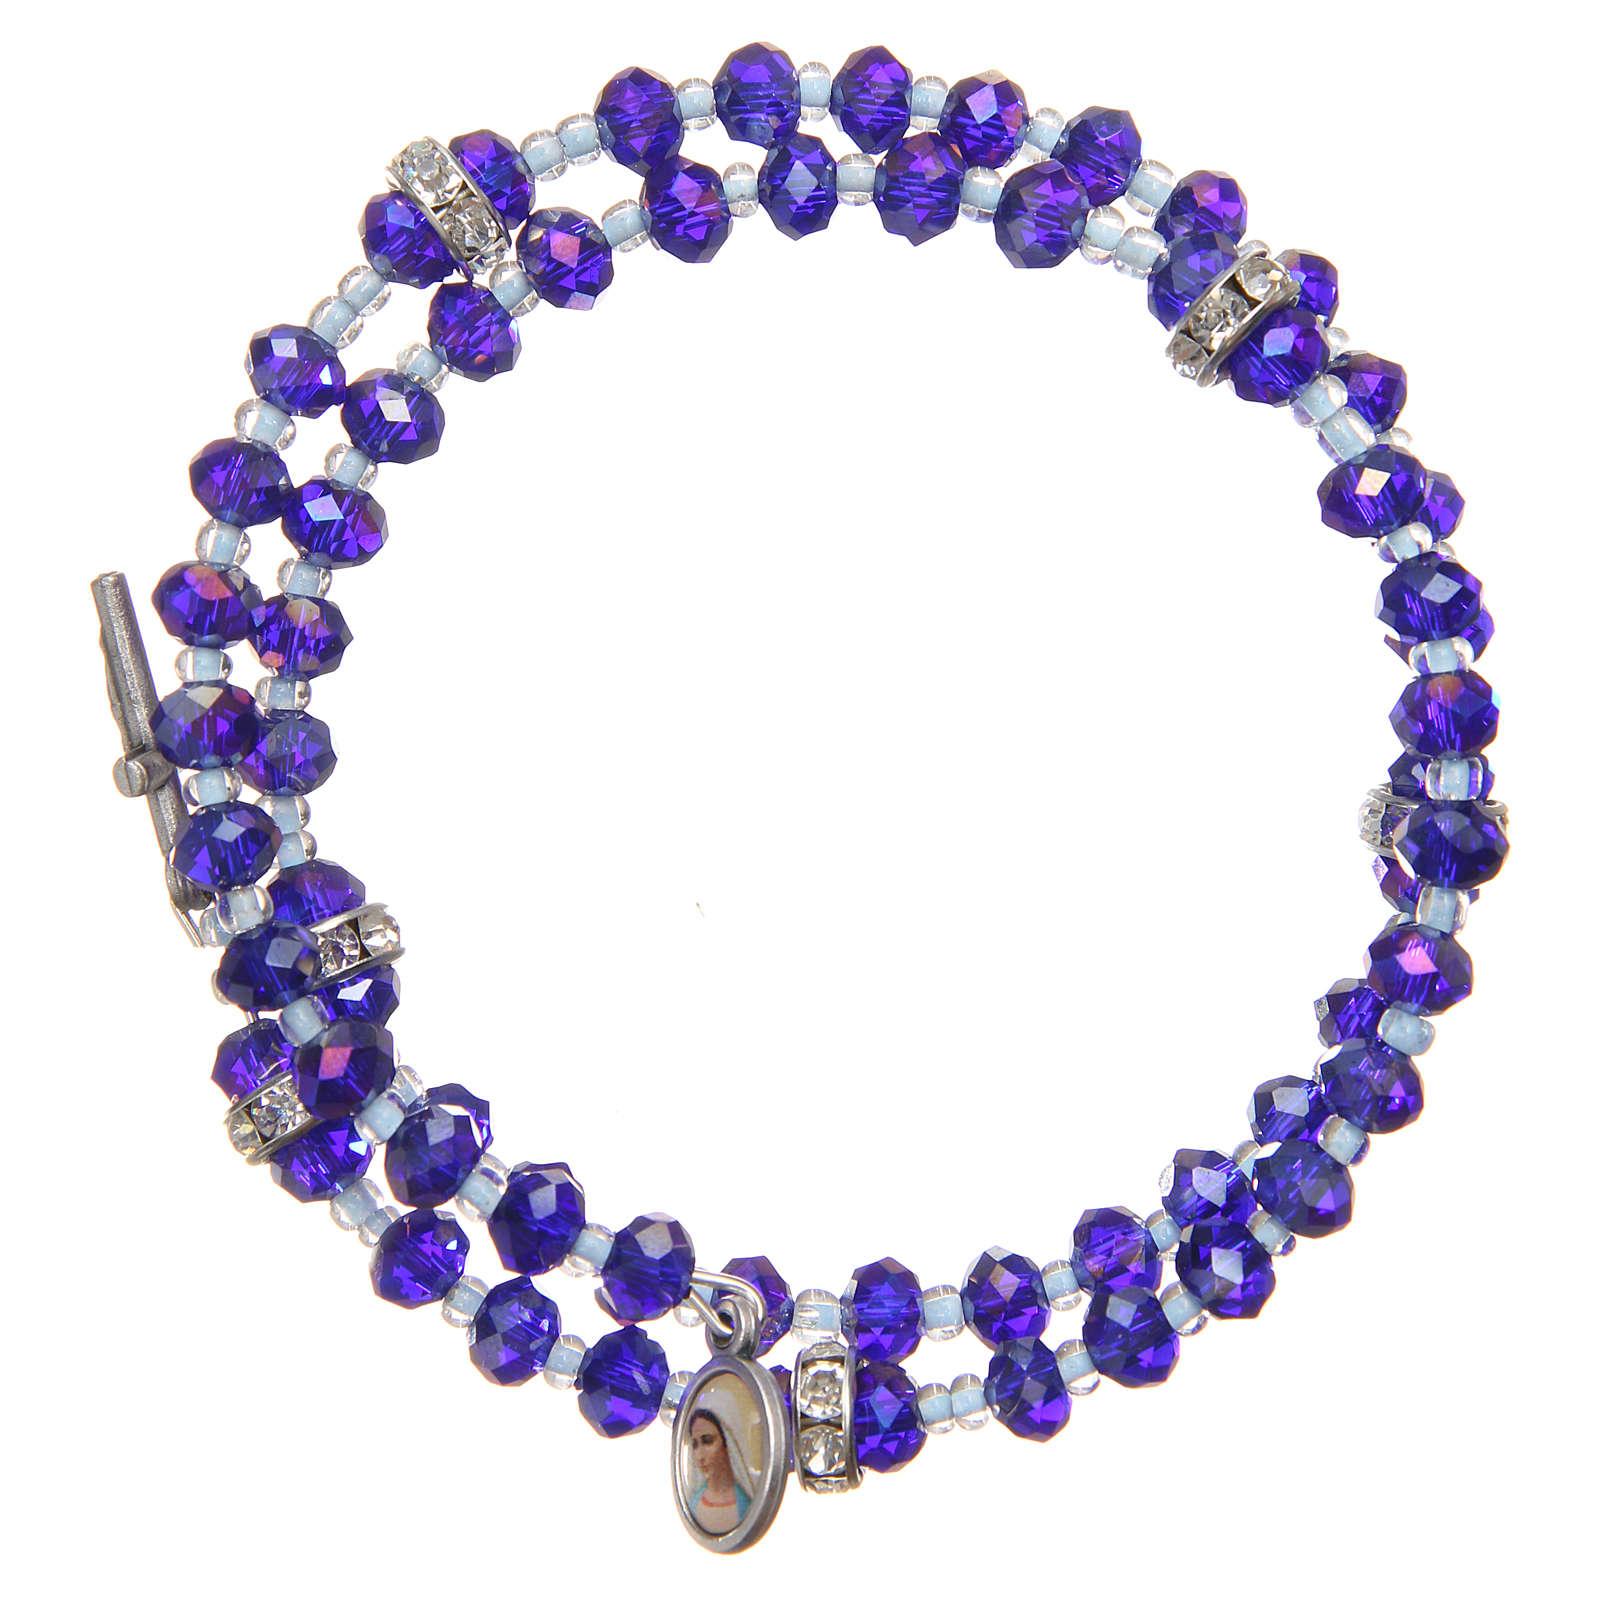 Braccialetto a molla perline viola blu croce Madonna Medjugorje 4